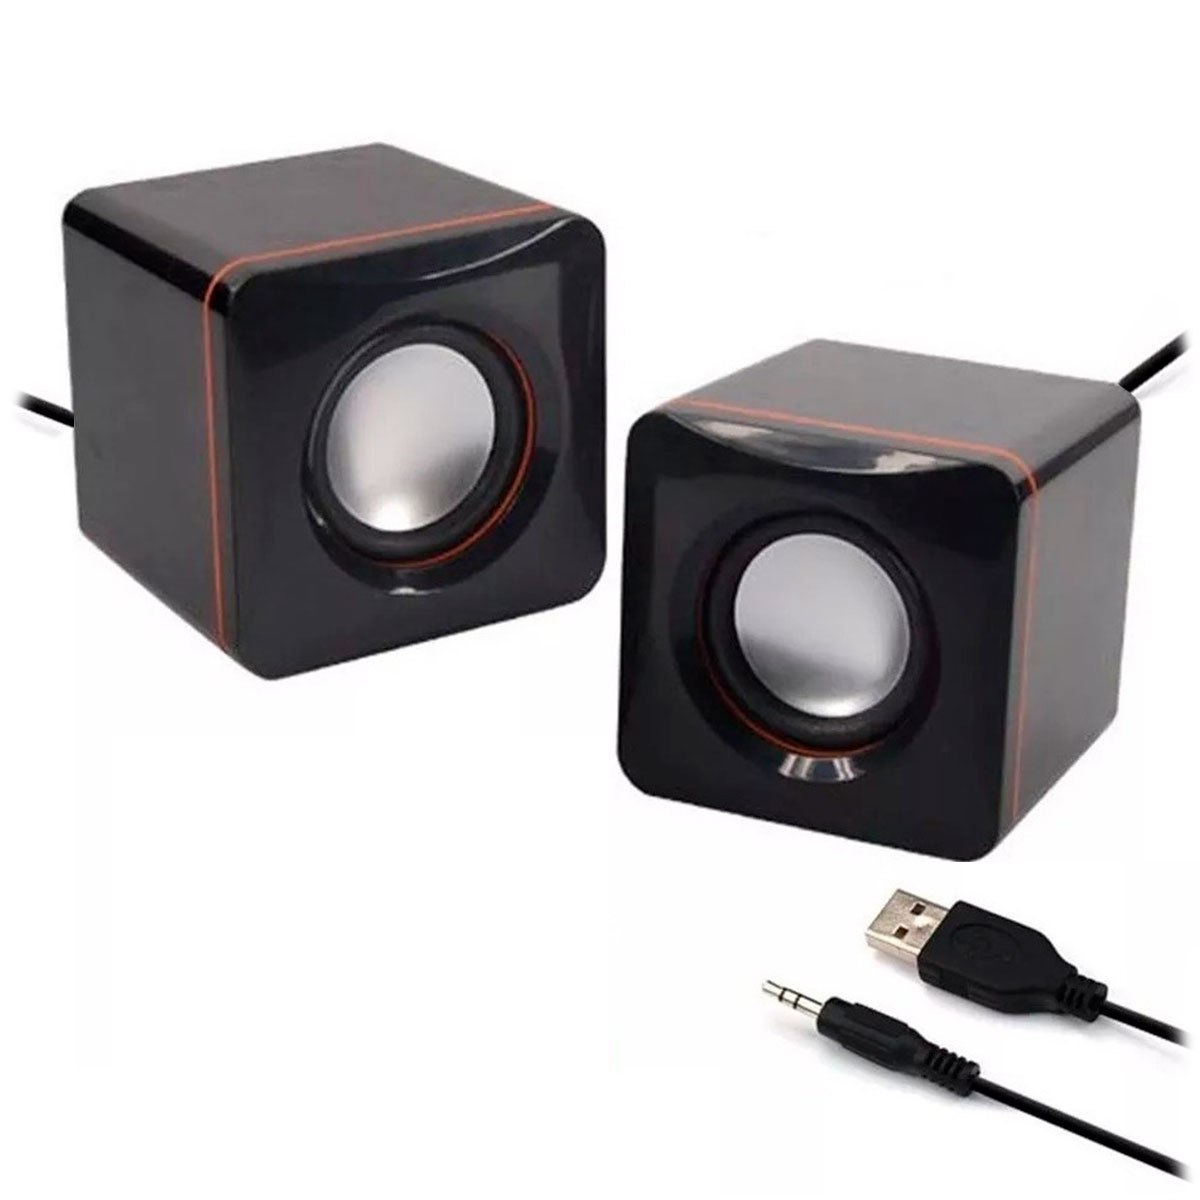 Caixa de Som Mini GV Brasil PRF.448 G-101C - USB 2.0, 2.5W RMS